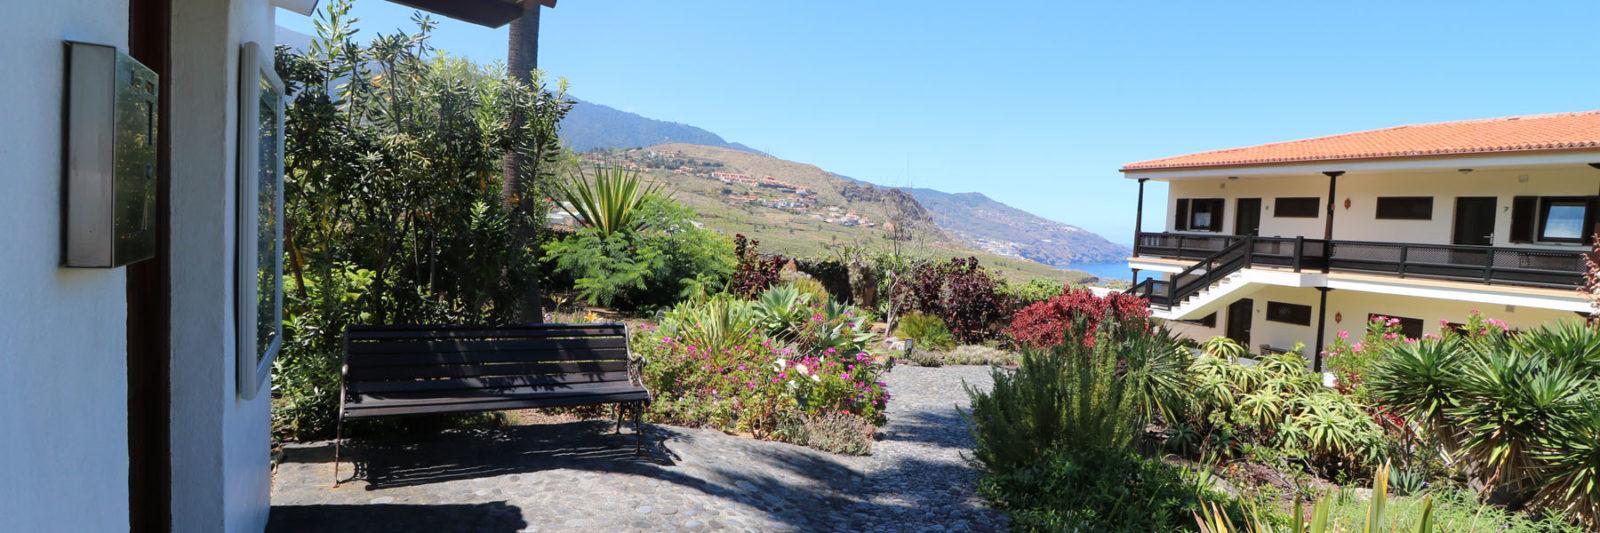 La Palma - Apartments Miranda - Reception - View